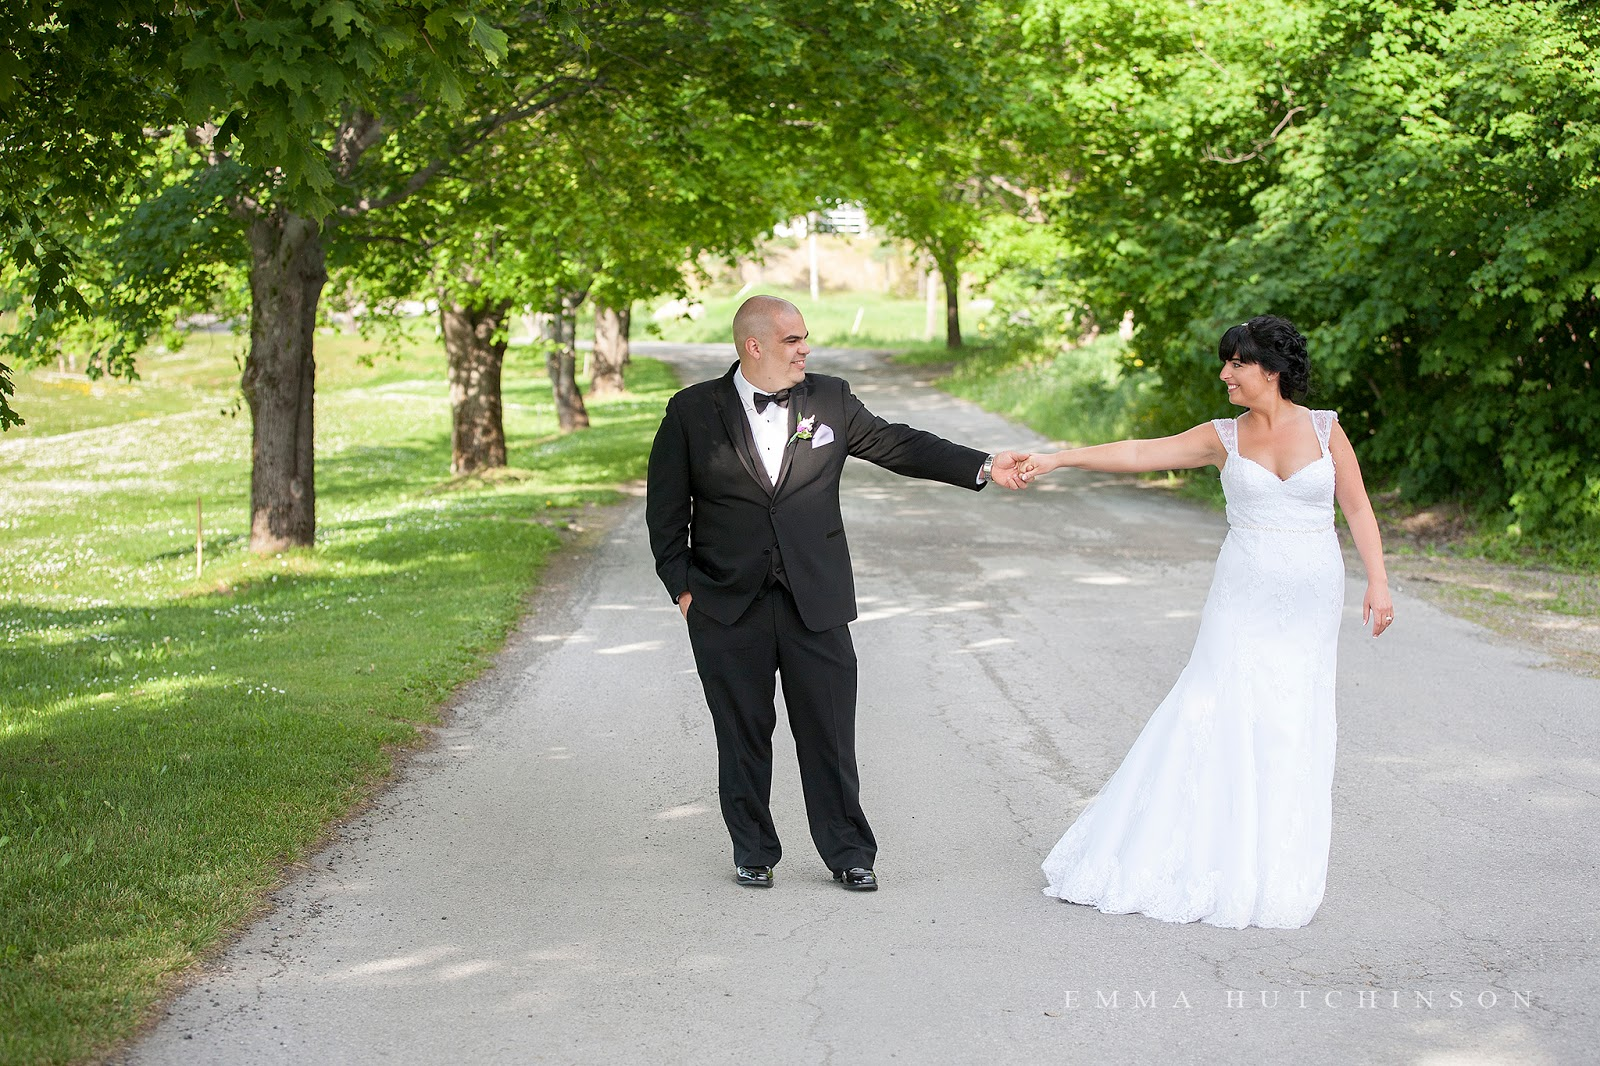 wedding dress from Olivia's Bridal, Topsail Road, St. John's, NL